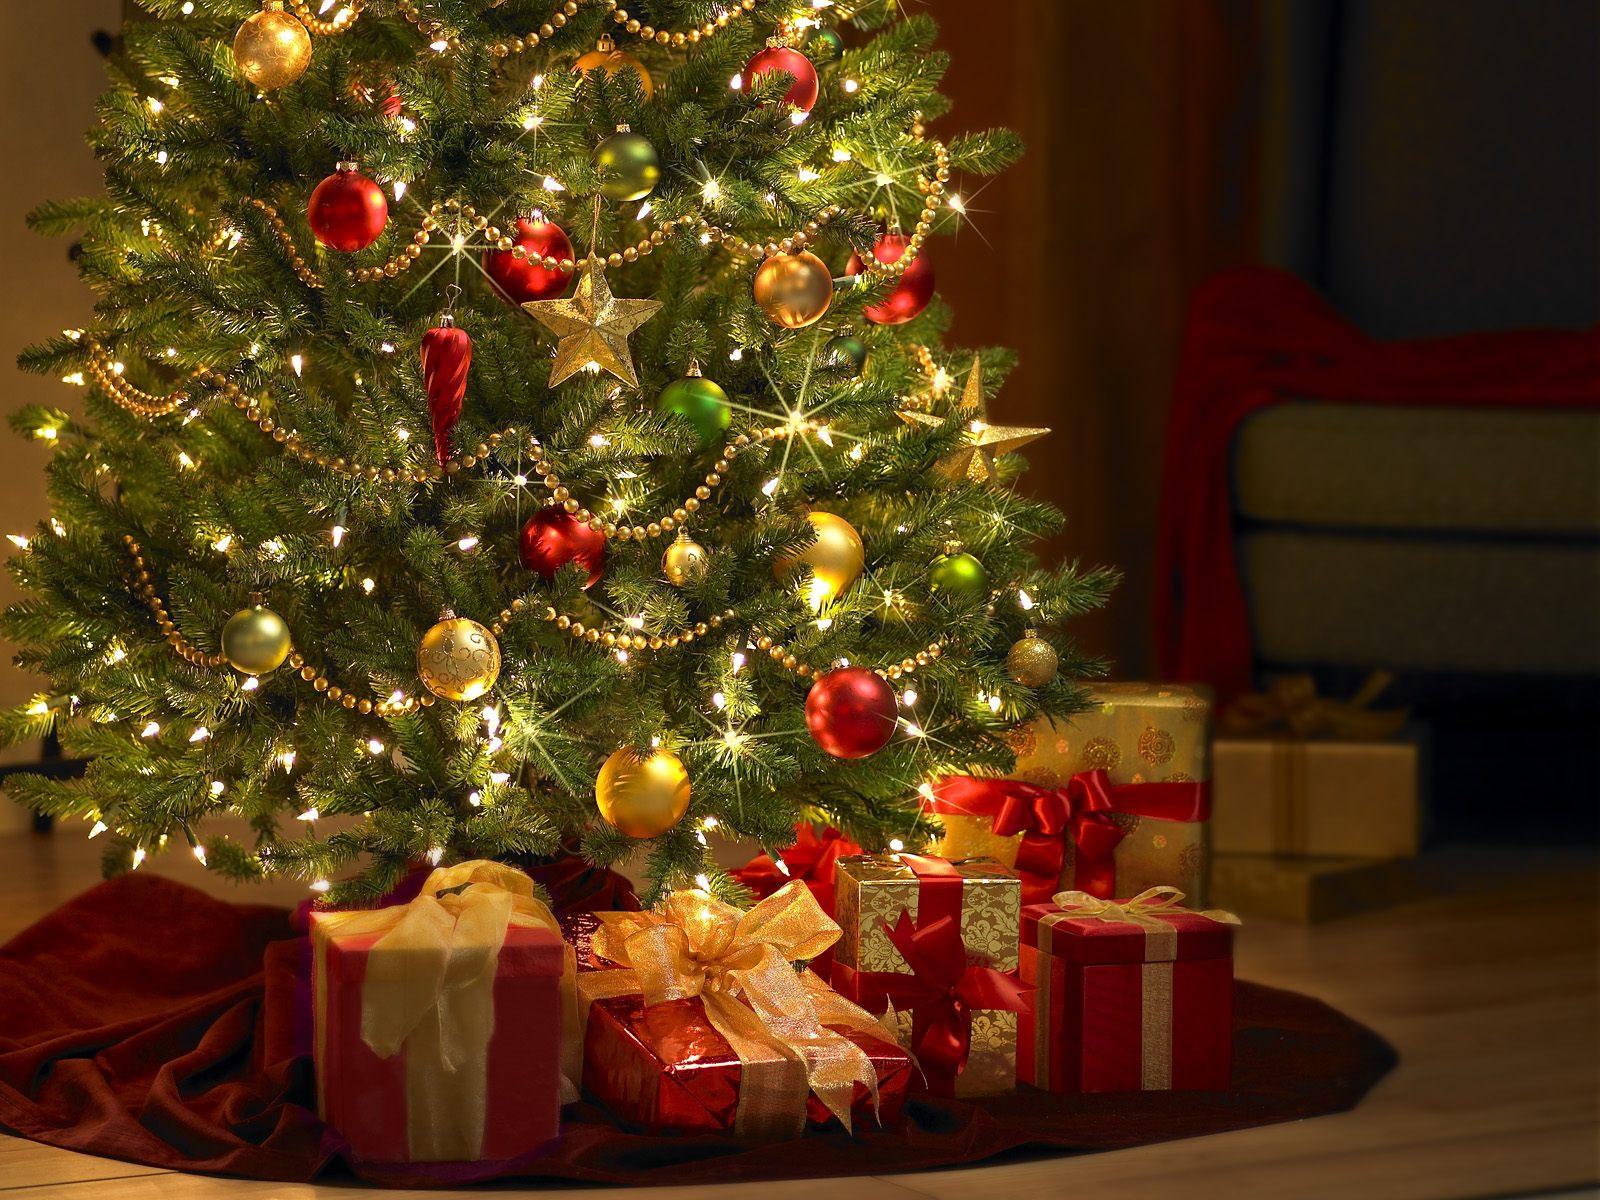 http://4.bp.blogspot.com/_X3odM3zhweU/TKIJ6lr5I4I/AAAAAAAABU0/Q5bal2PHgE4/s1600/Christmas+HD+desktop+wallpaper+animated-christmas-tree-computer-wallpaper.jpg